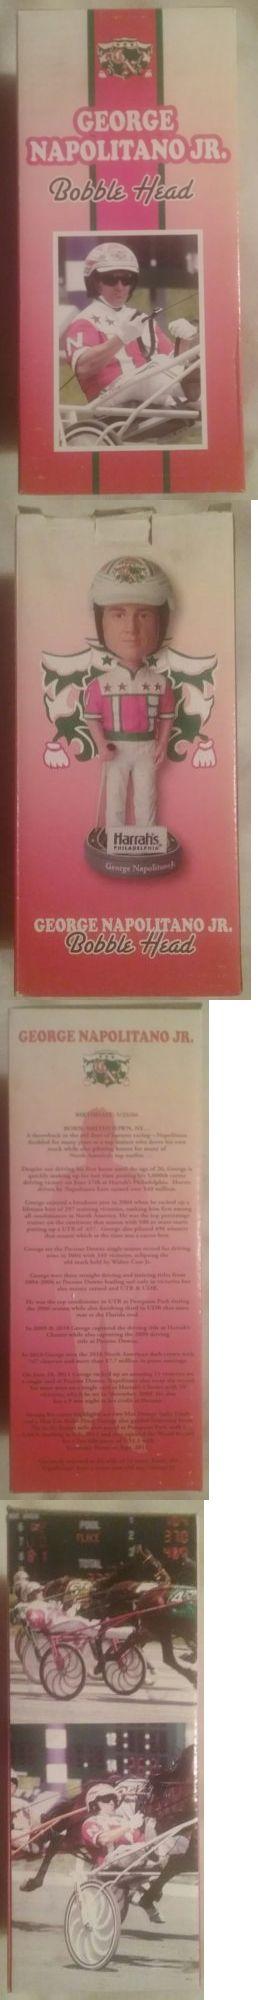 Horse Racing 429: George Napolitano Jr Bobblehead - Harness Racing - Harrahs Philadelphia -> BUY IT NOW ONLY: $99.95 on eBay!